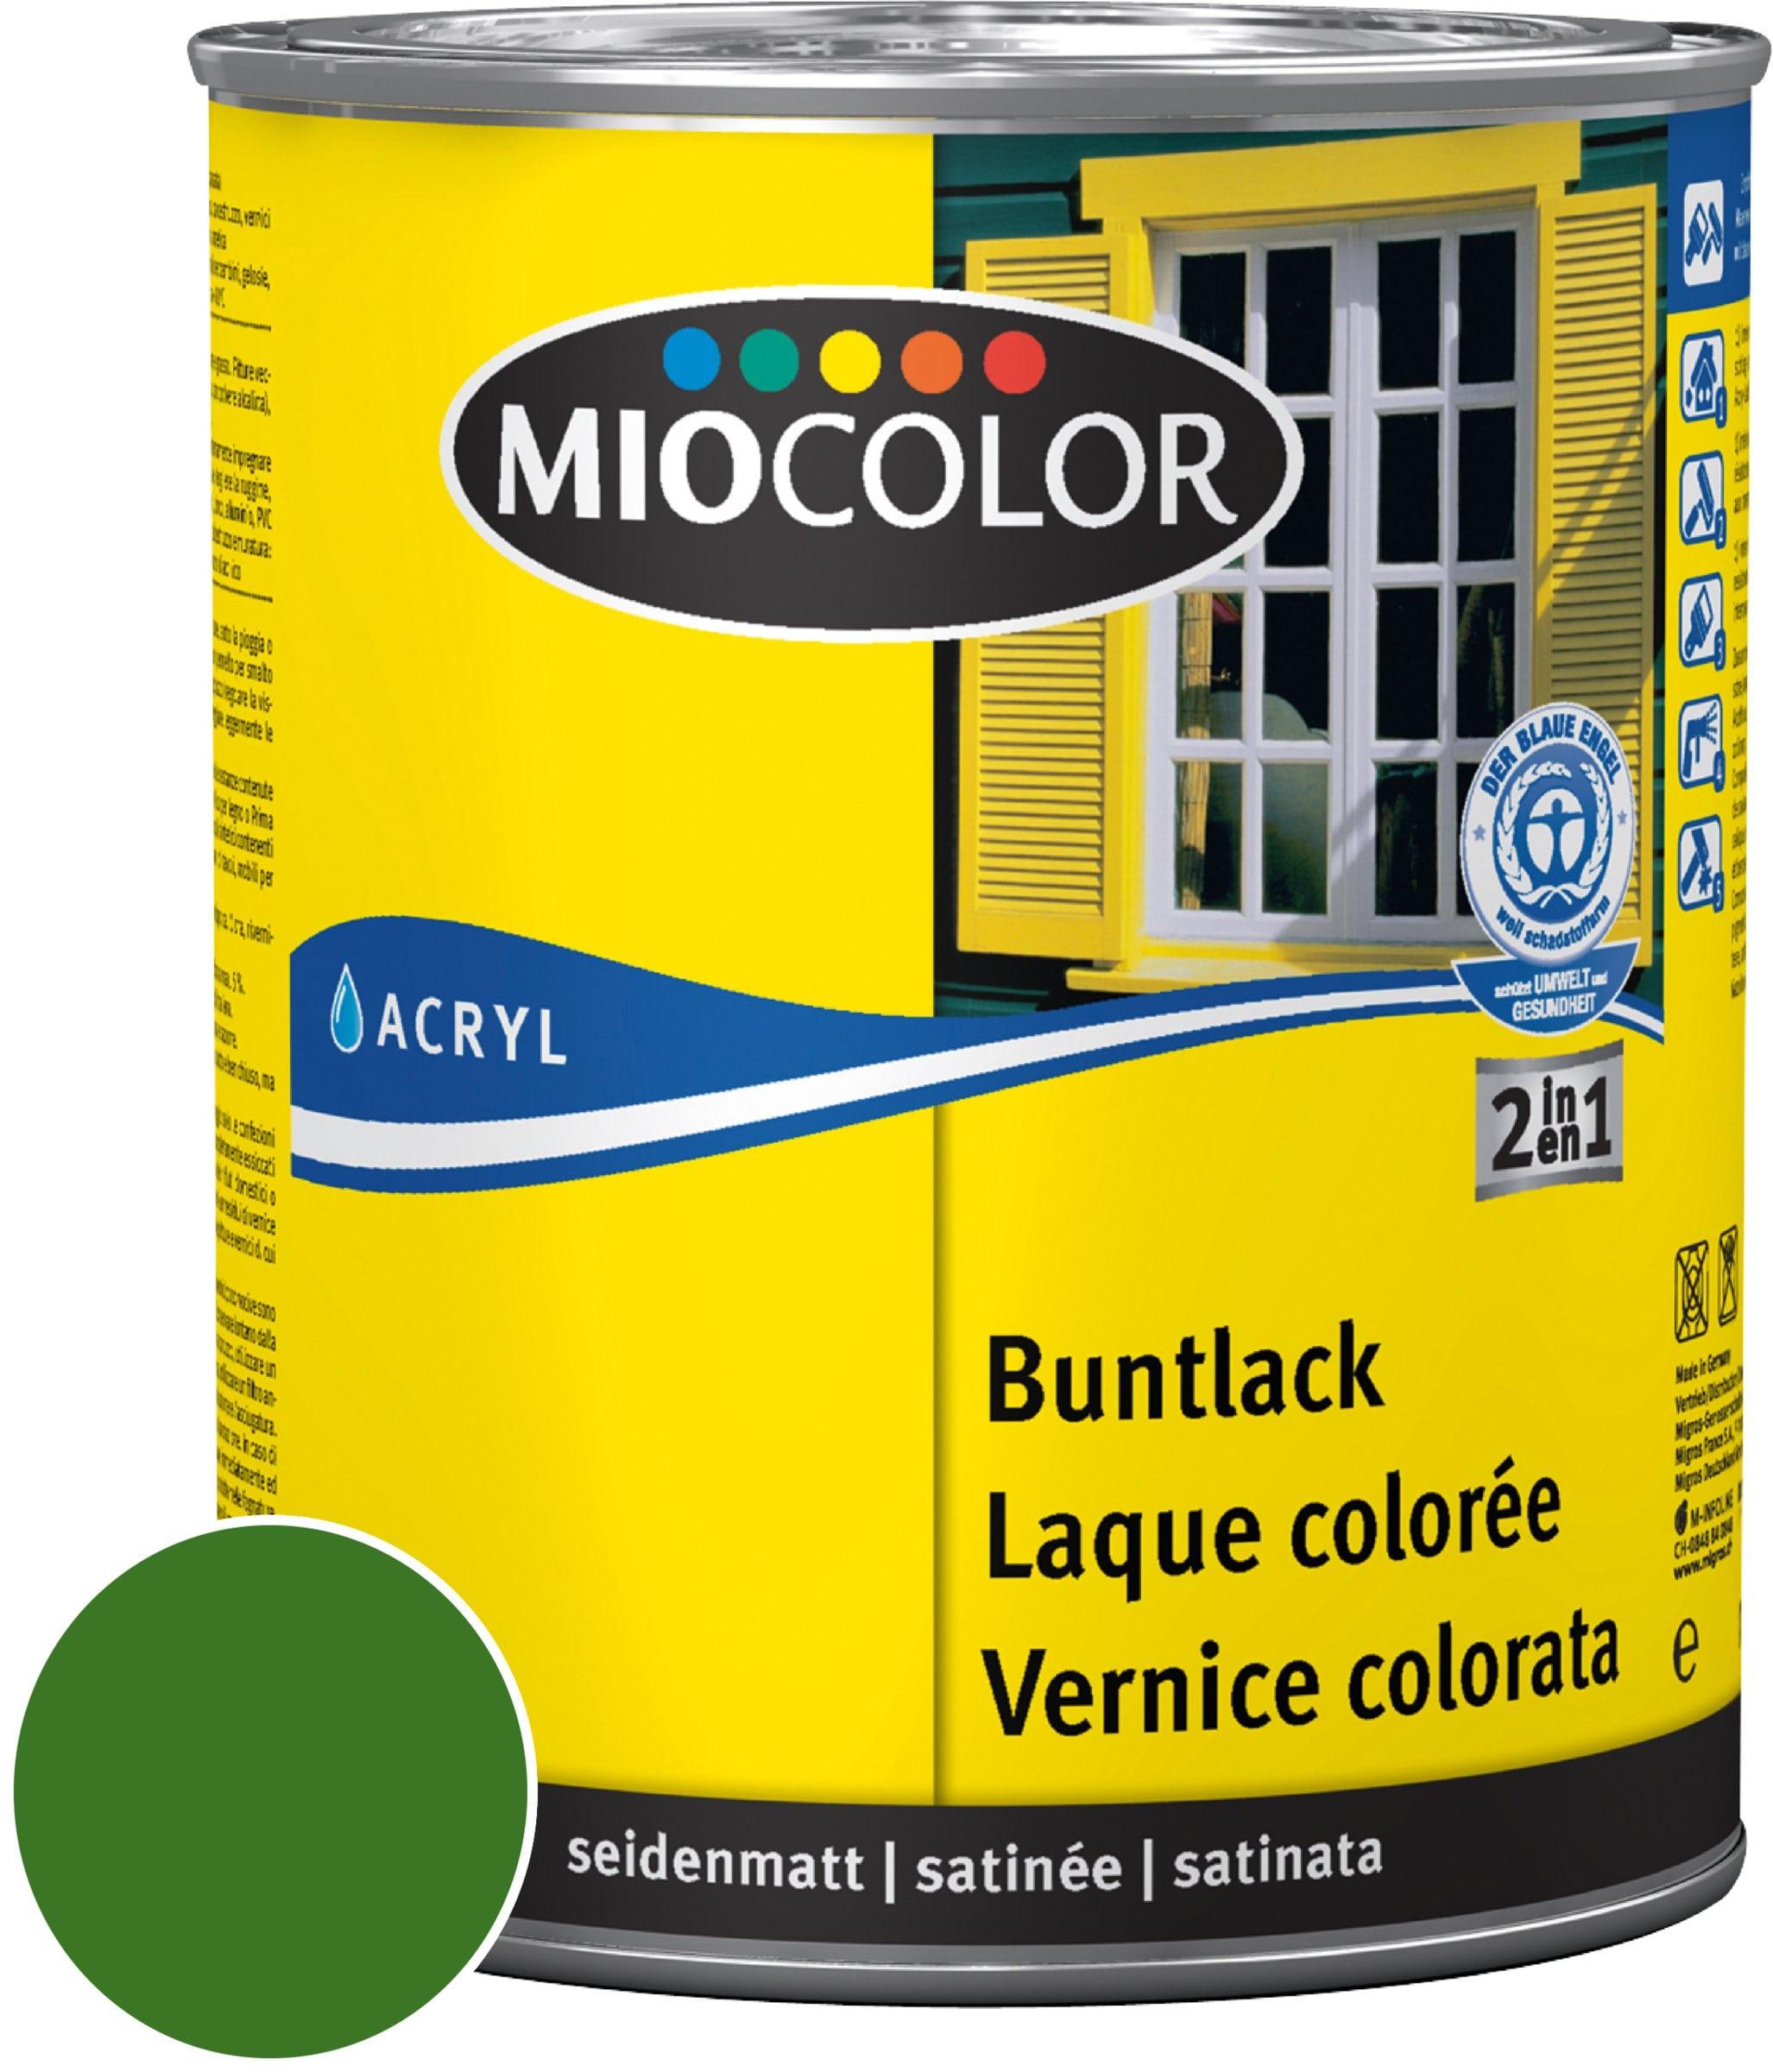 Miocolor Acryl Vernice colorata satinata Verde foglio 750 ml